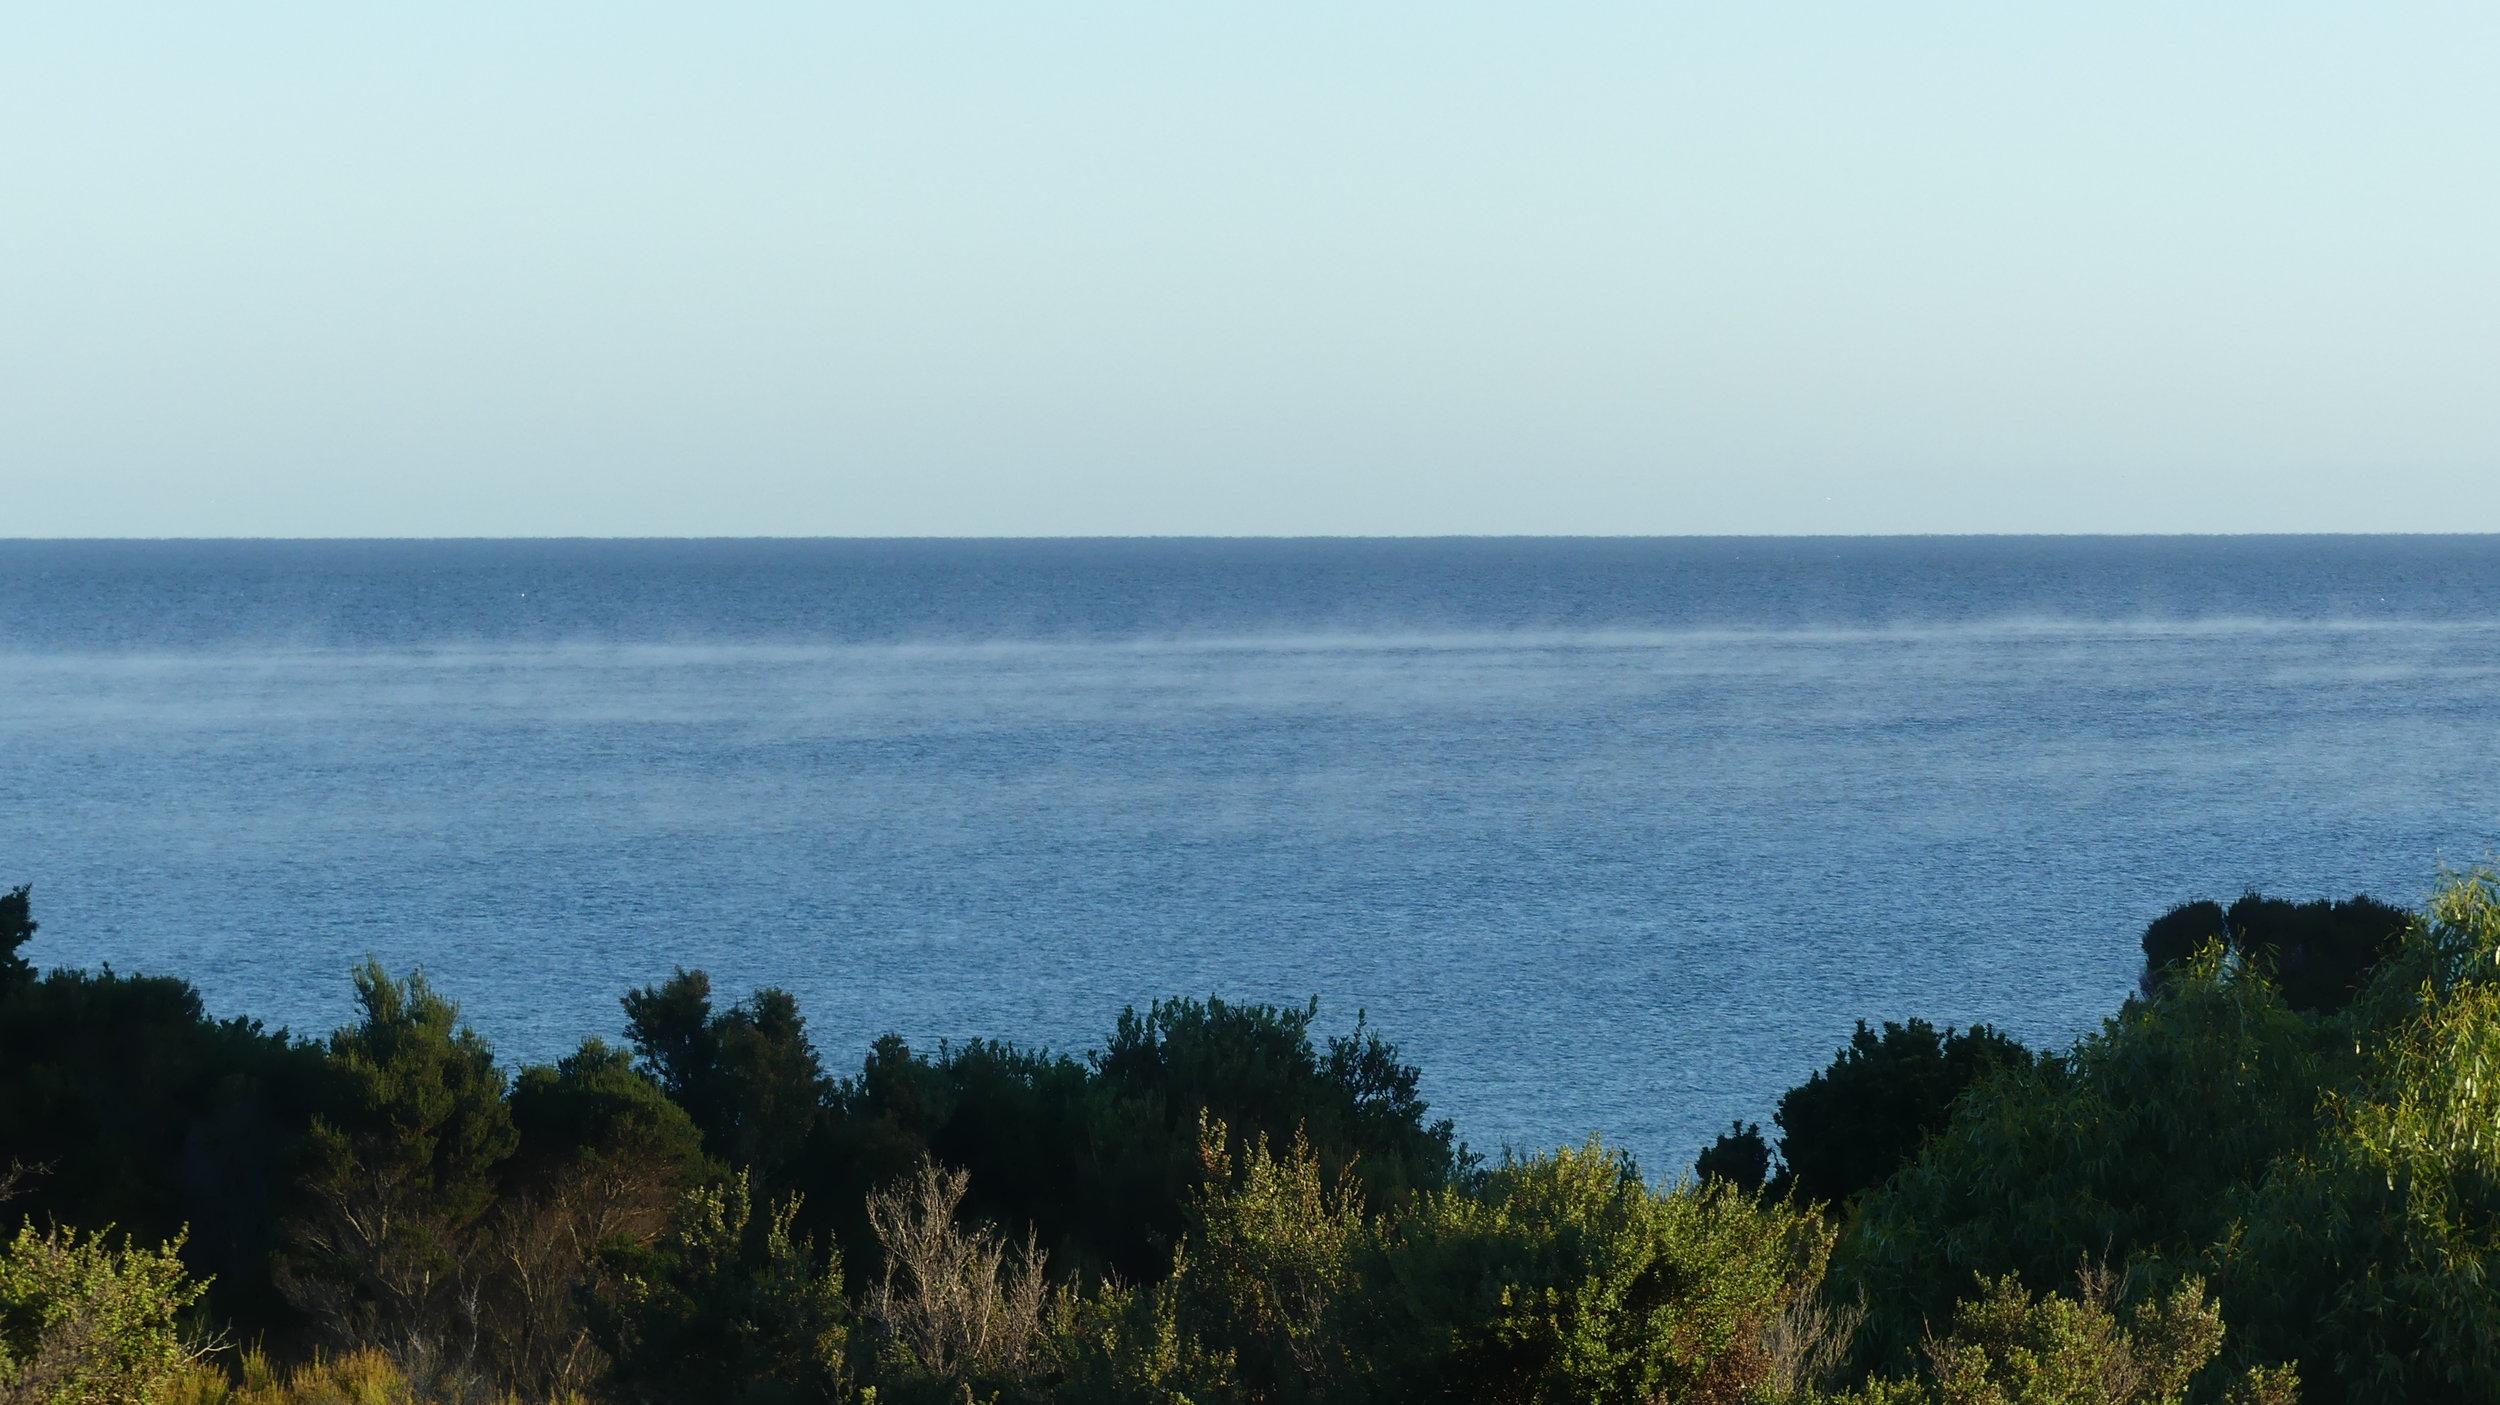 Whispy mist o'er the sea